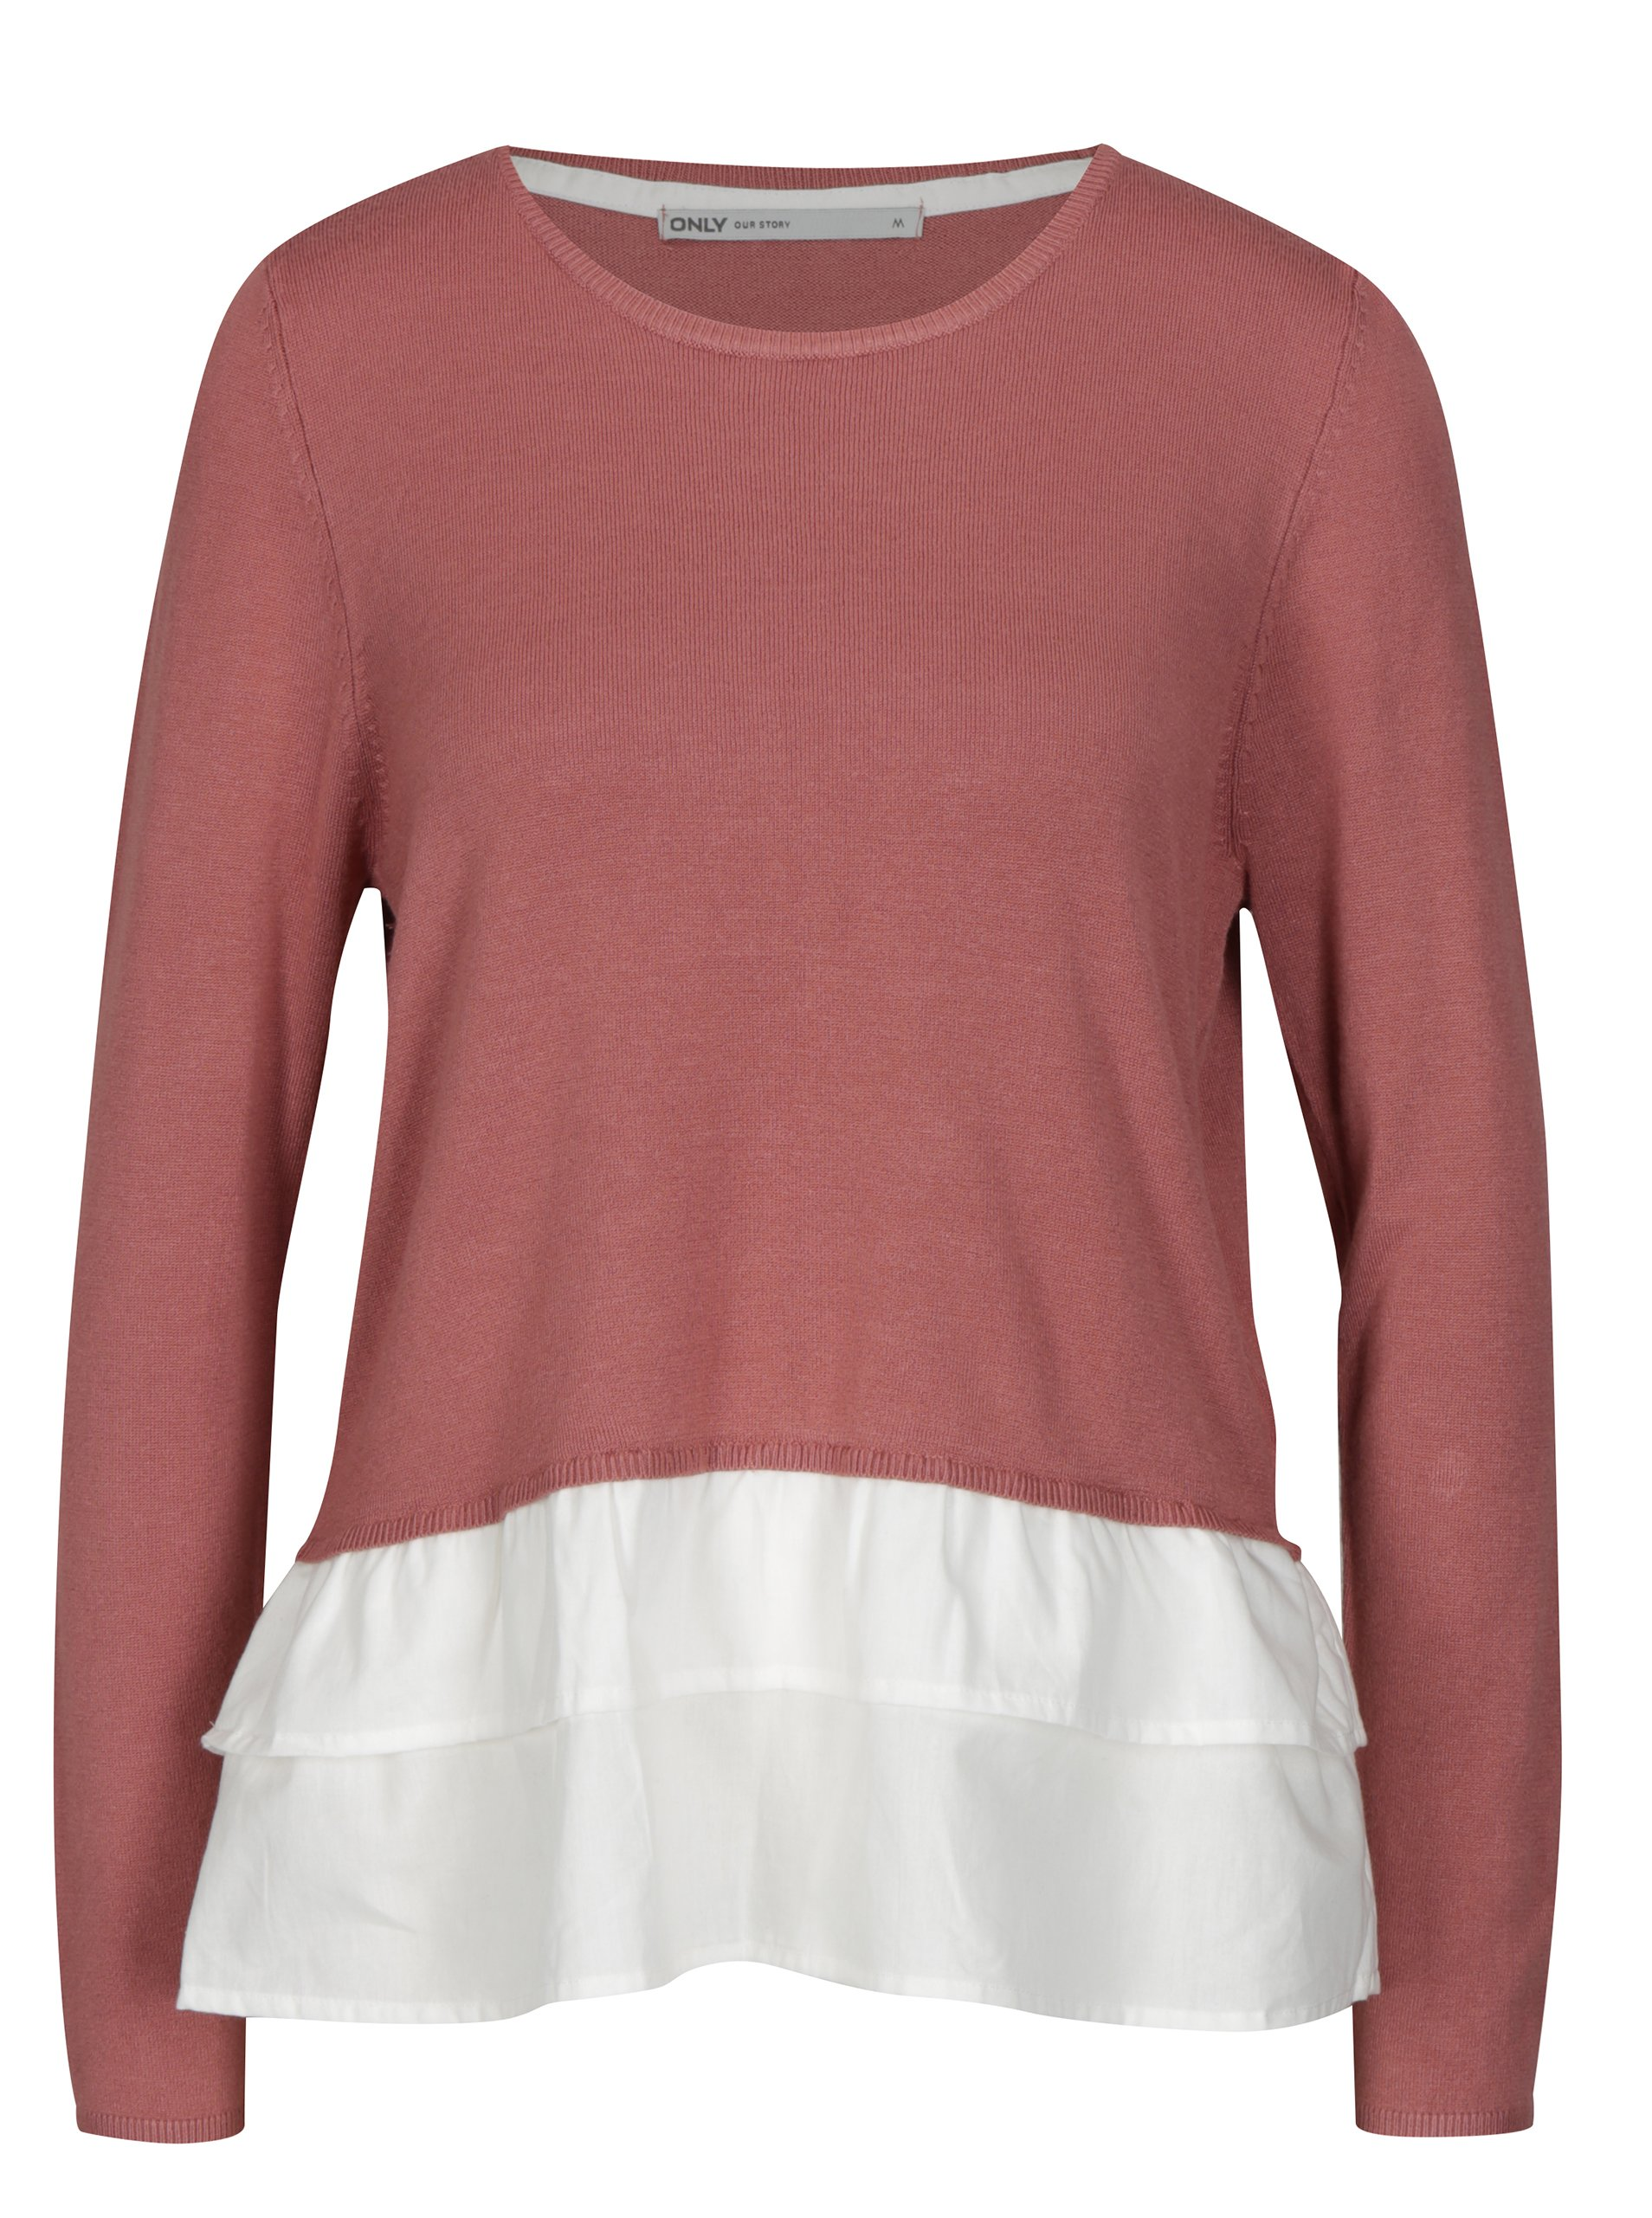 Fotografie Starorůžový lehký svetr s všitou košilovou částí ONLY Gingham